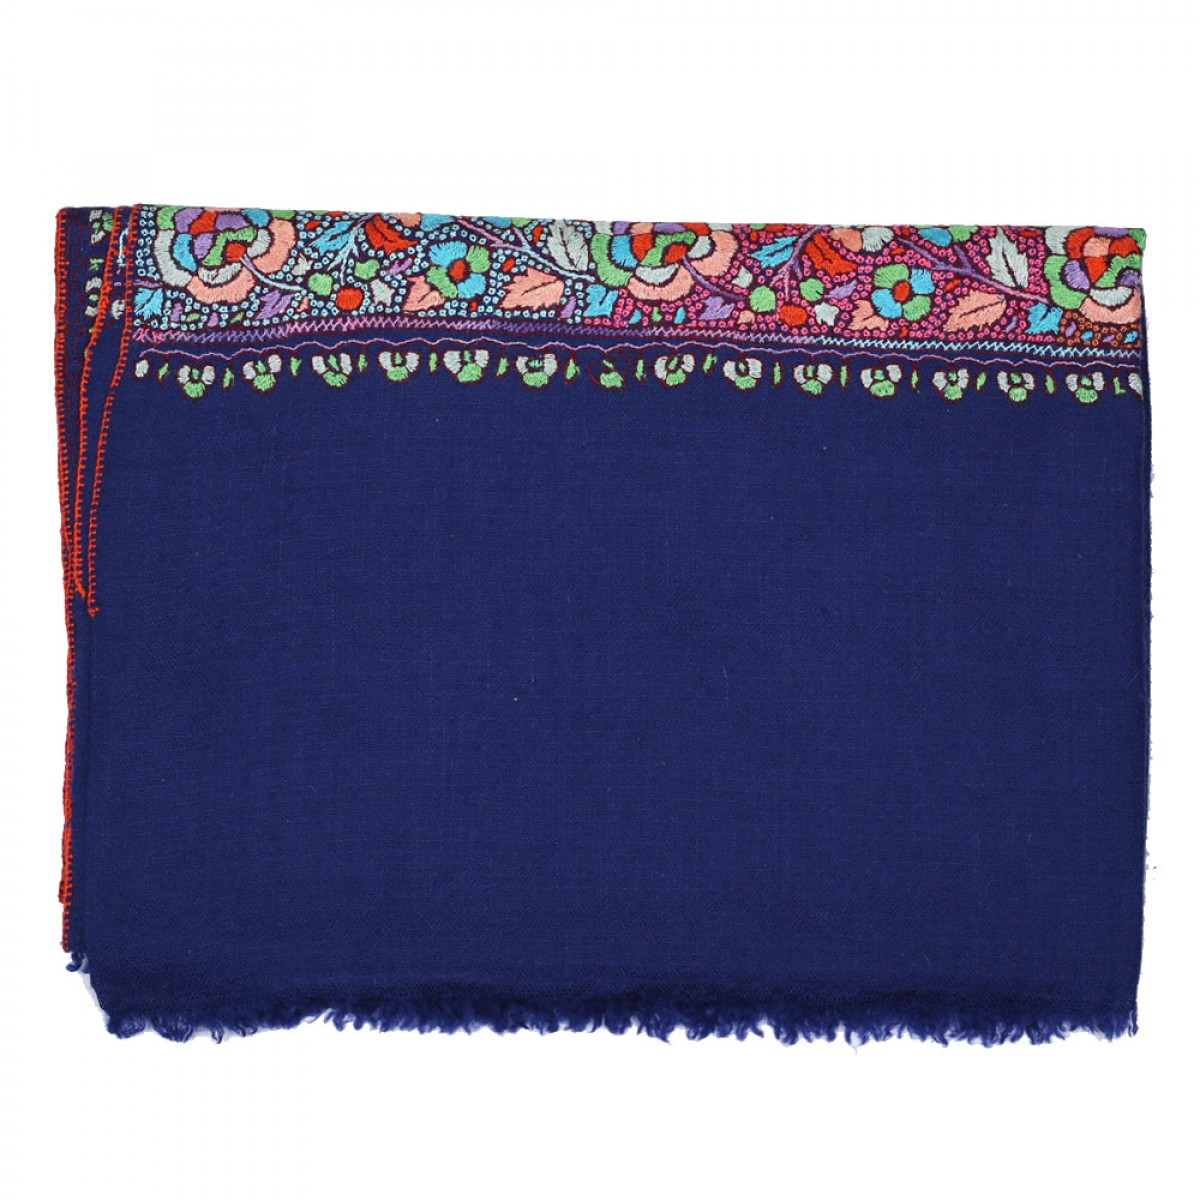 Embroidery Handloom Pashmina - Midnight Blue